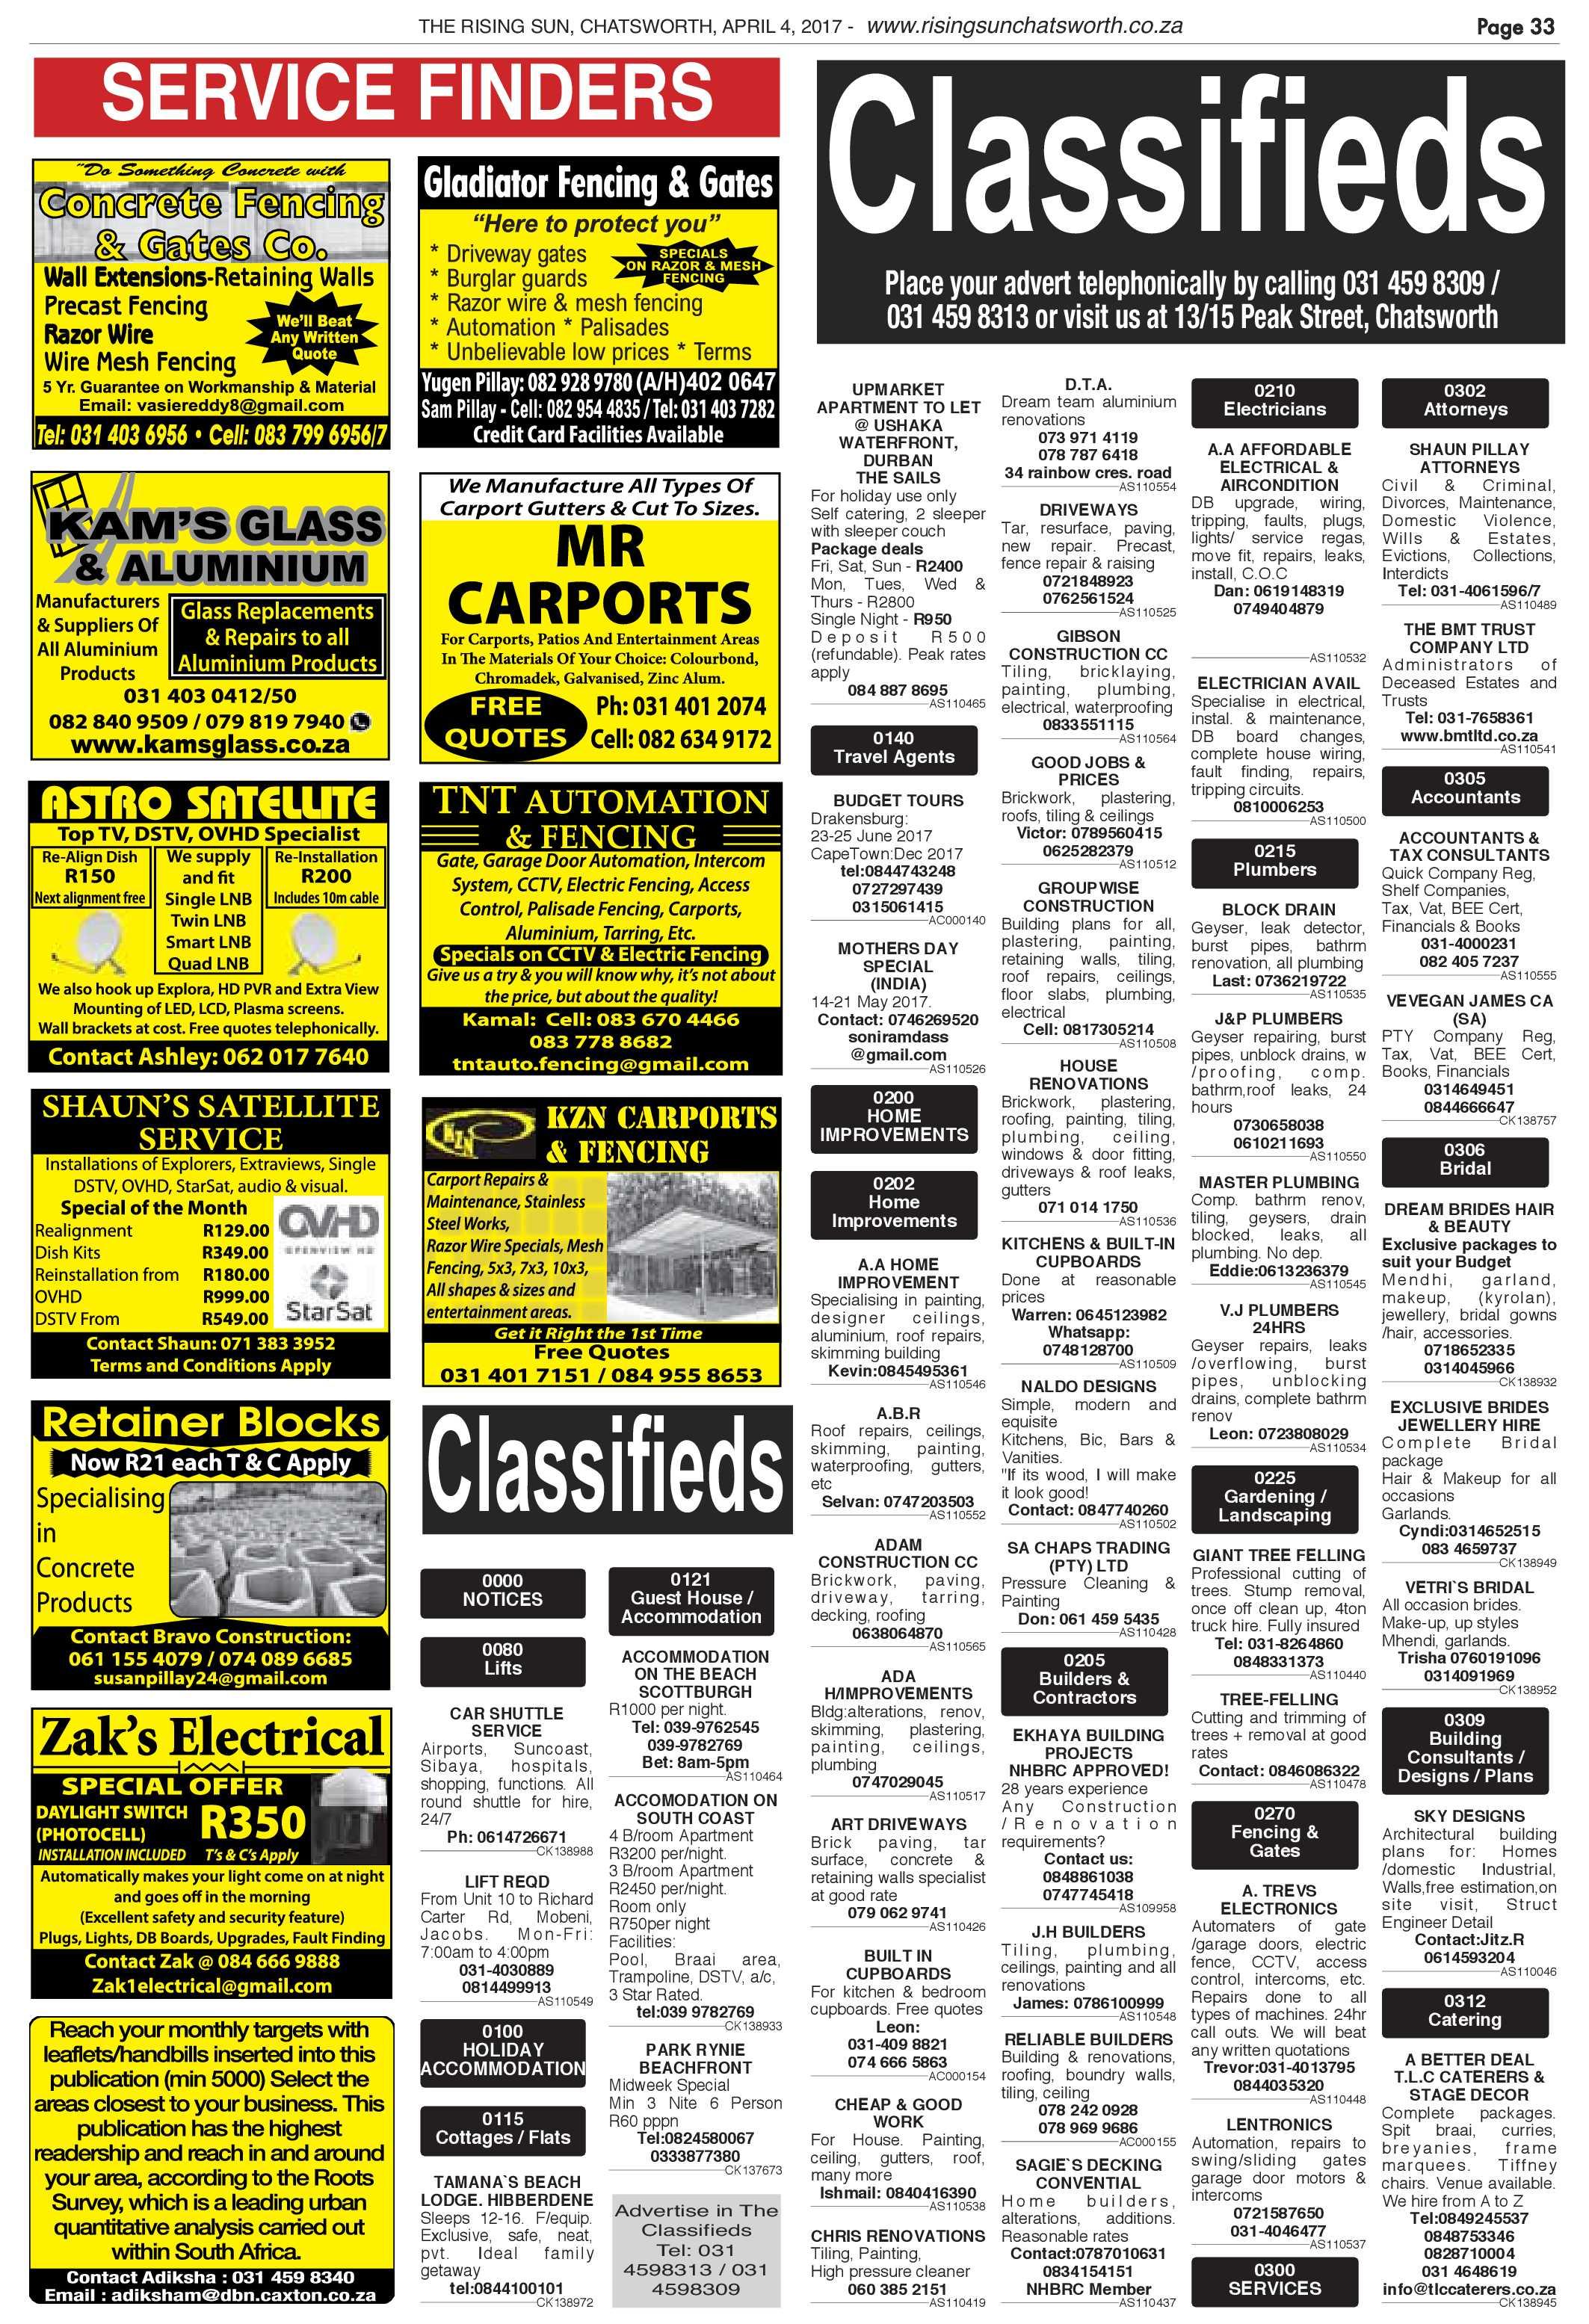 Chatsworth April 4 Rising Sun Dstv Smart Lnb Installation Diagram Epapers Page 37